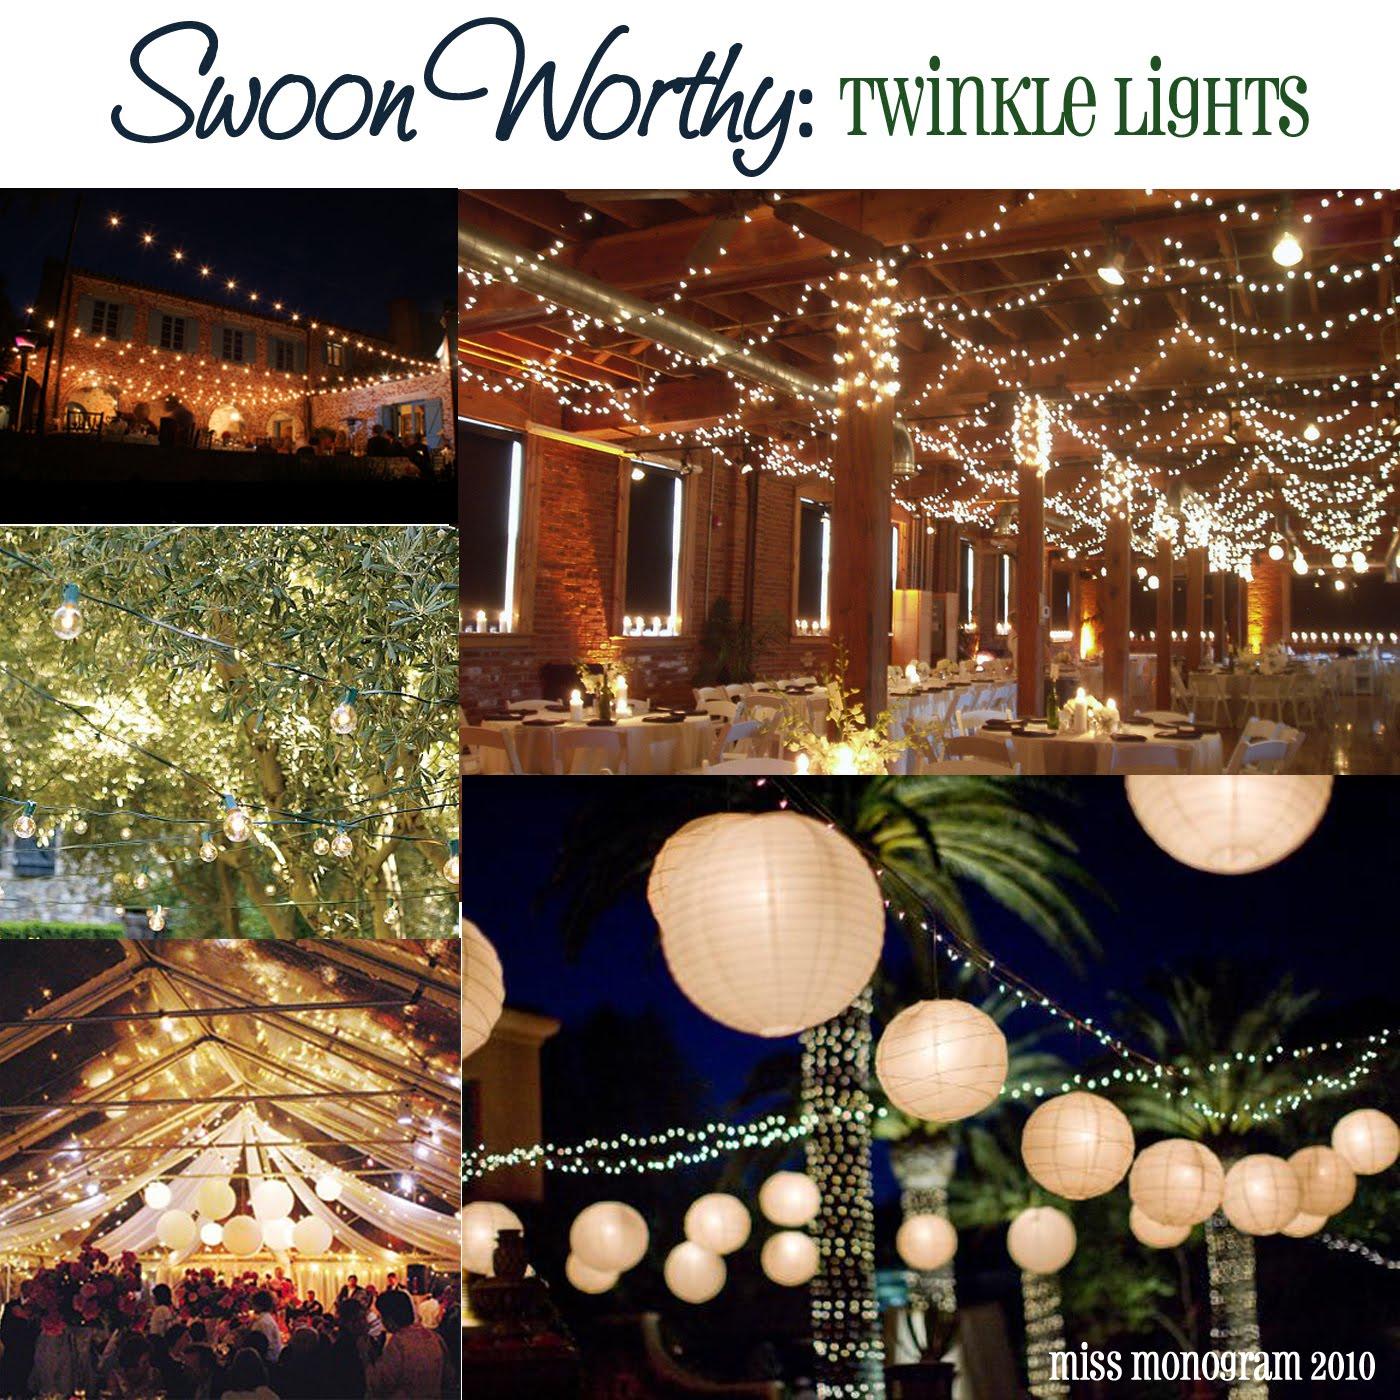 Backyard Twinkle Lights: Swoon Worthy Friday: Twinkle Lights